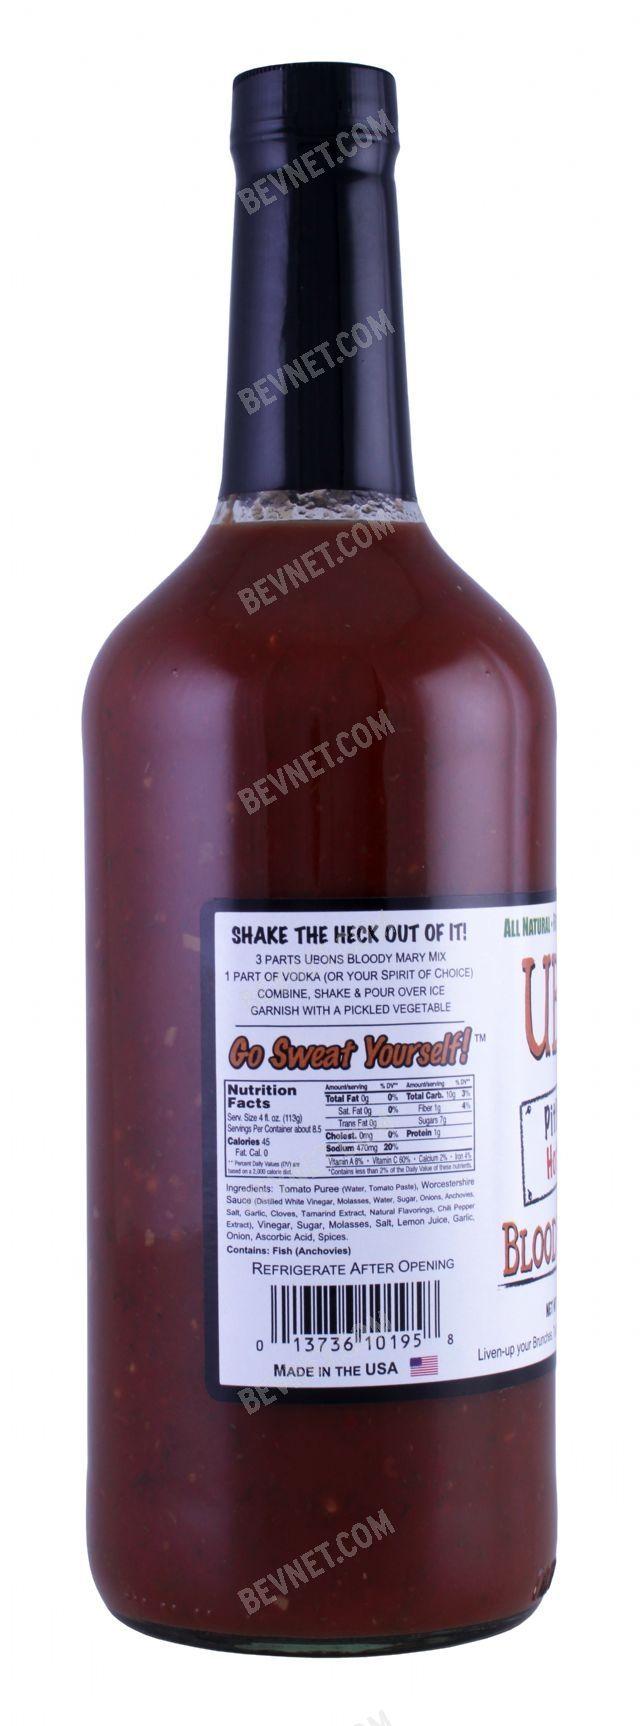 Ubons Bloody Mary Mix: